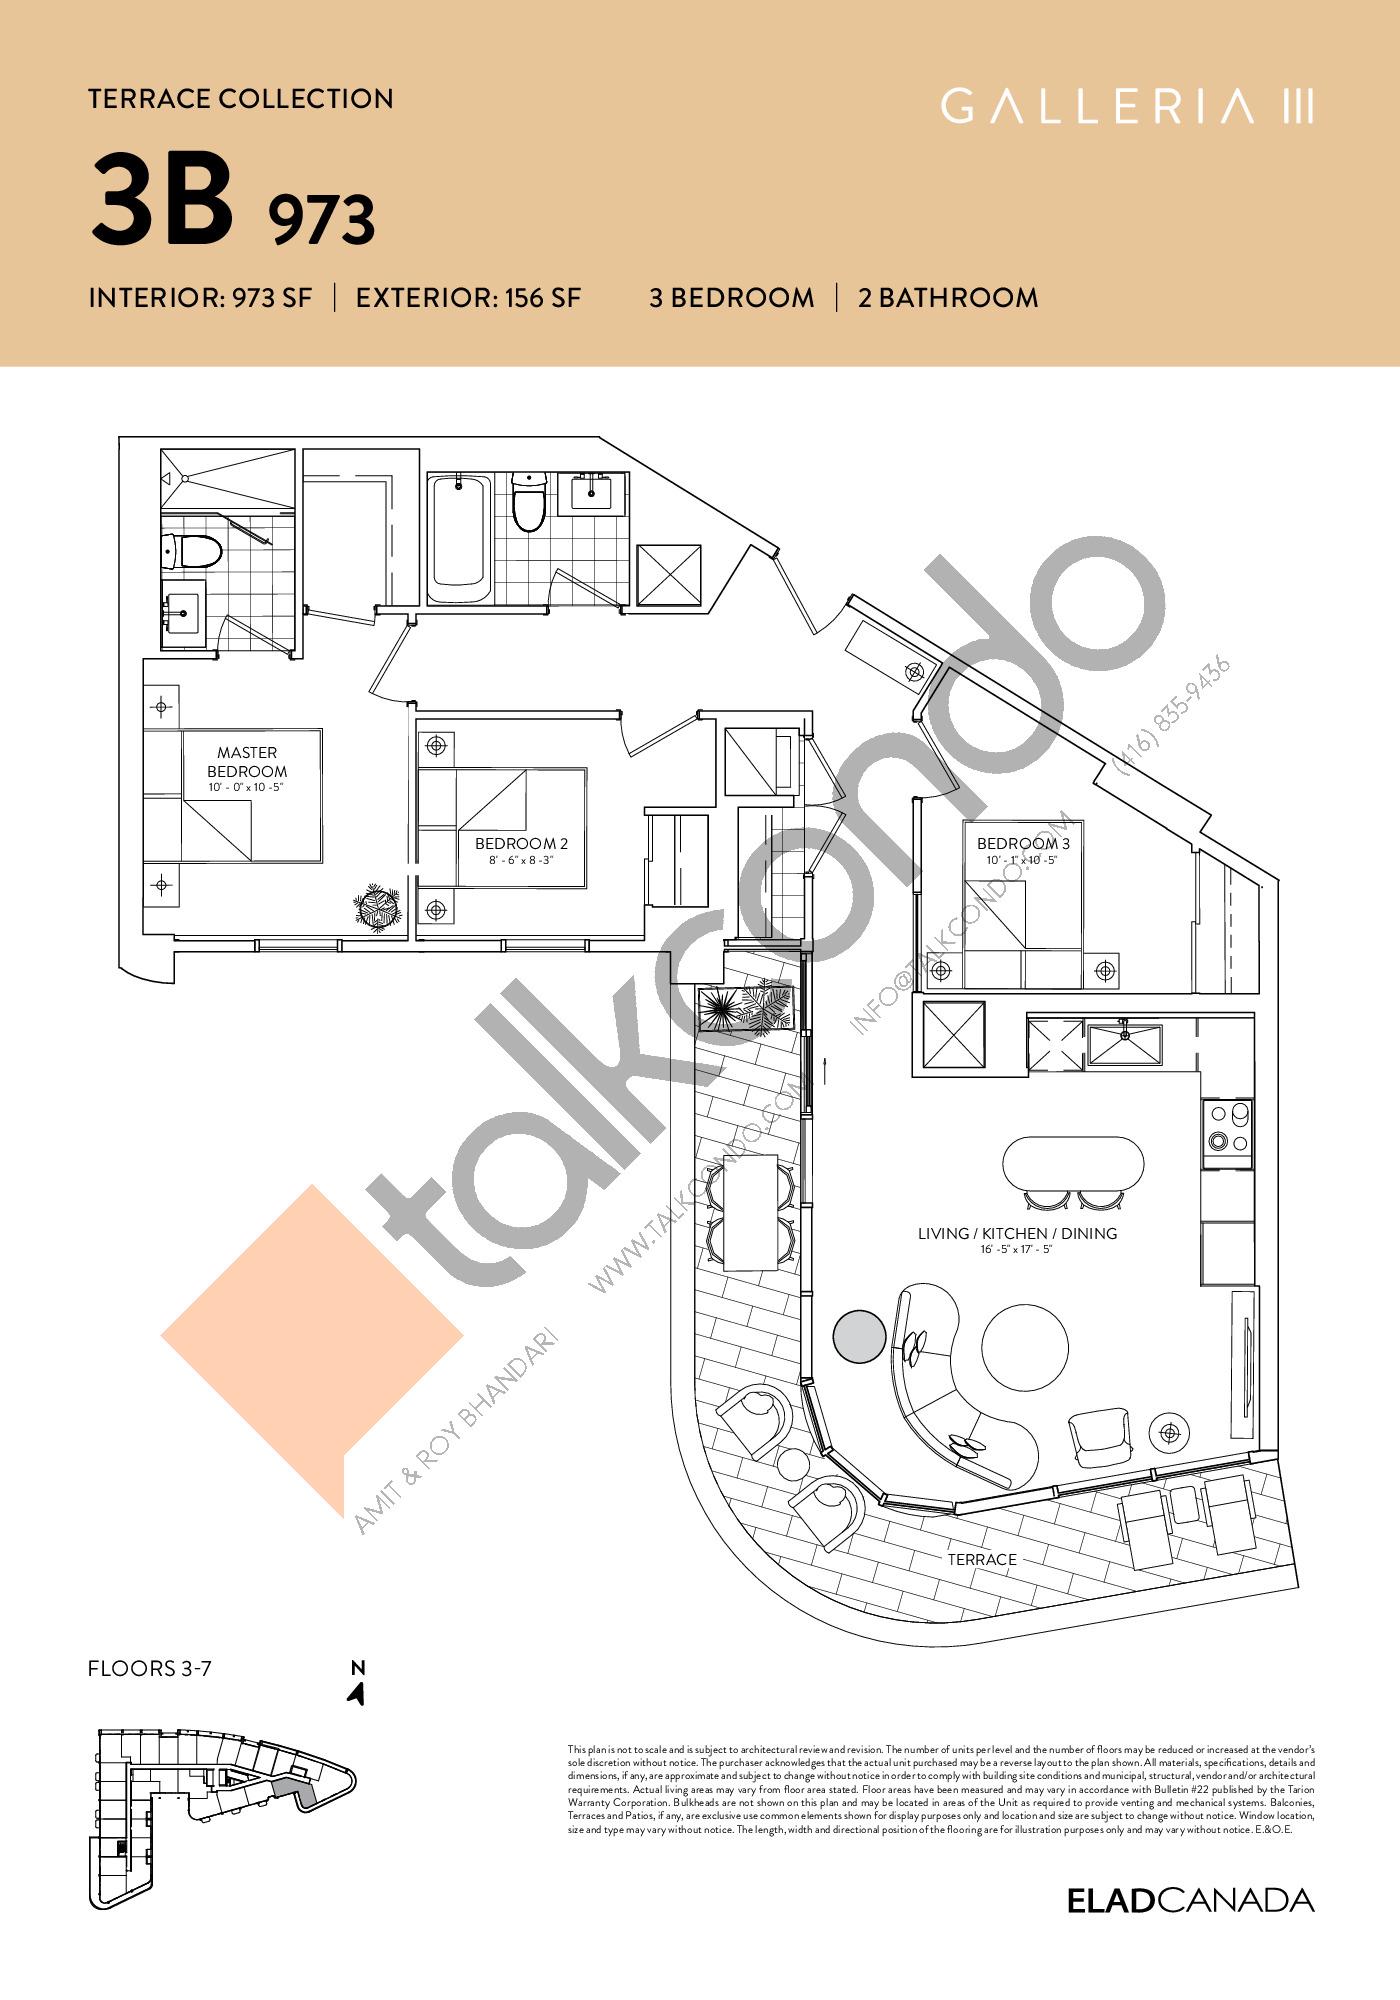 3B 973 - Terrace Collection Floor Plan at Galleria 03 Condos - 973 sq.ft